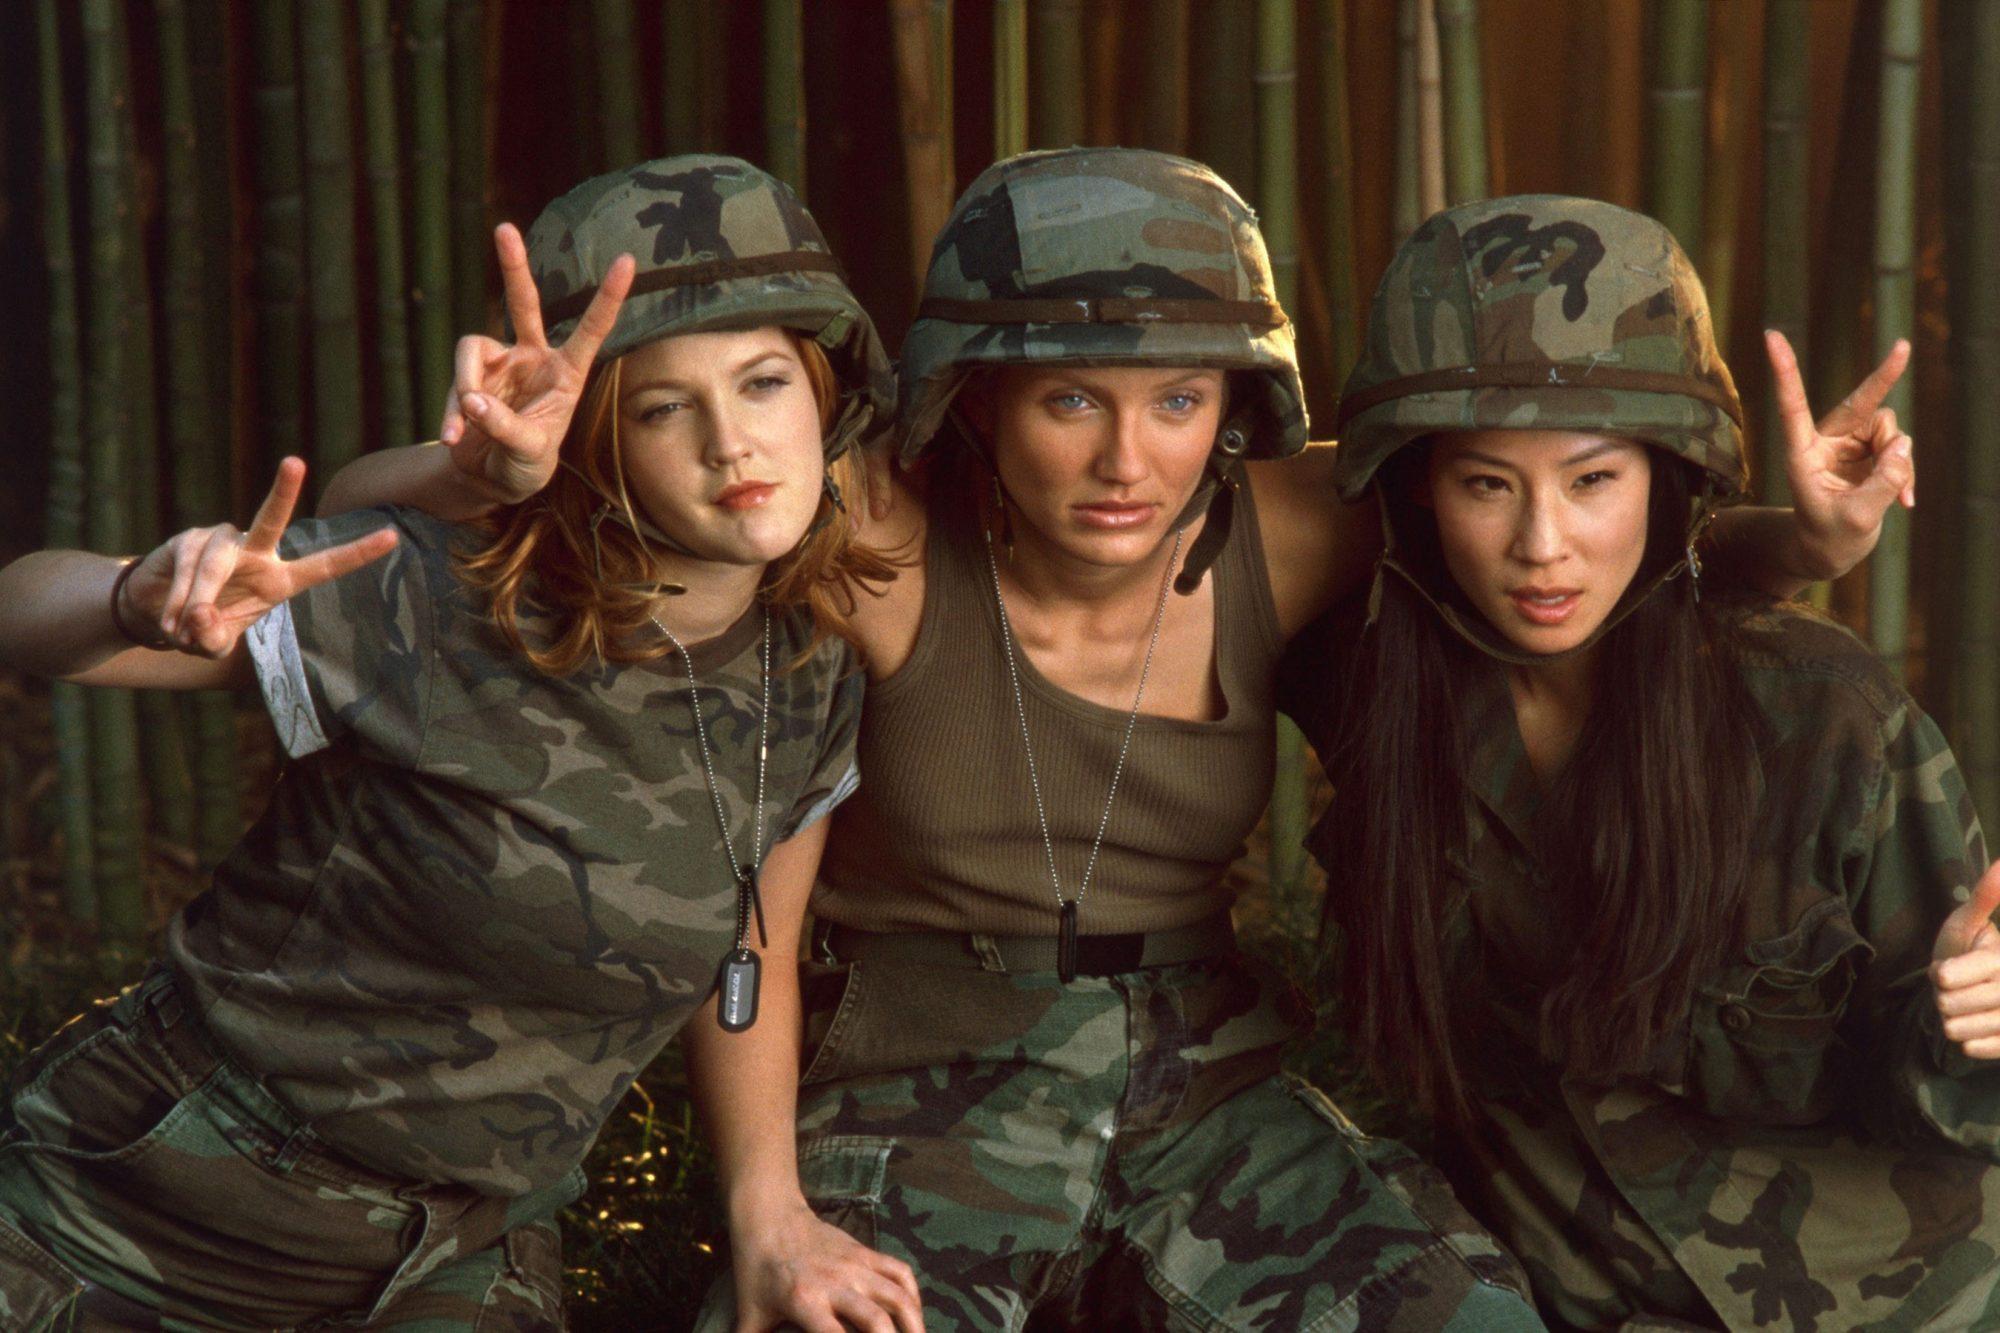 CHARLIE'S ANGELS, Drew Barrymore, Cameron Diaz, Lucy Liu, 2000, (c) Columbia/courtesy Everett Collec